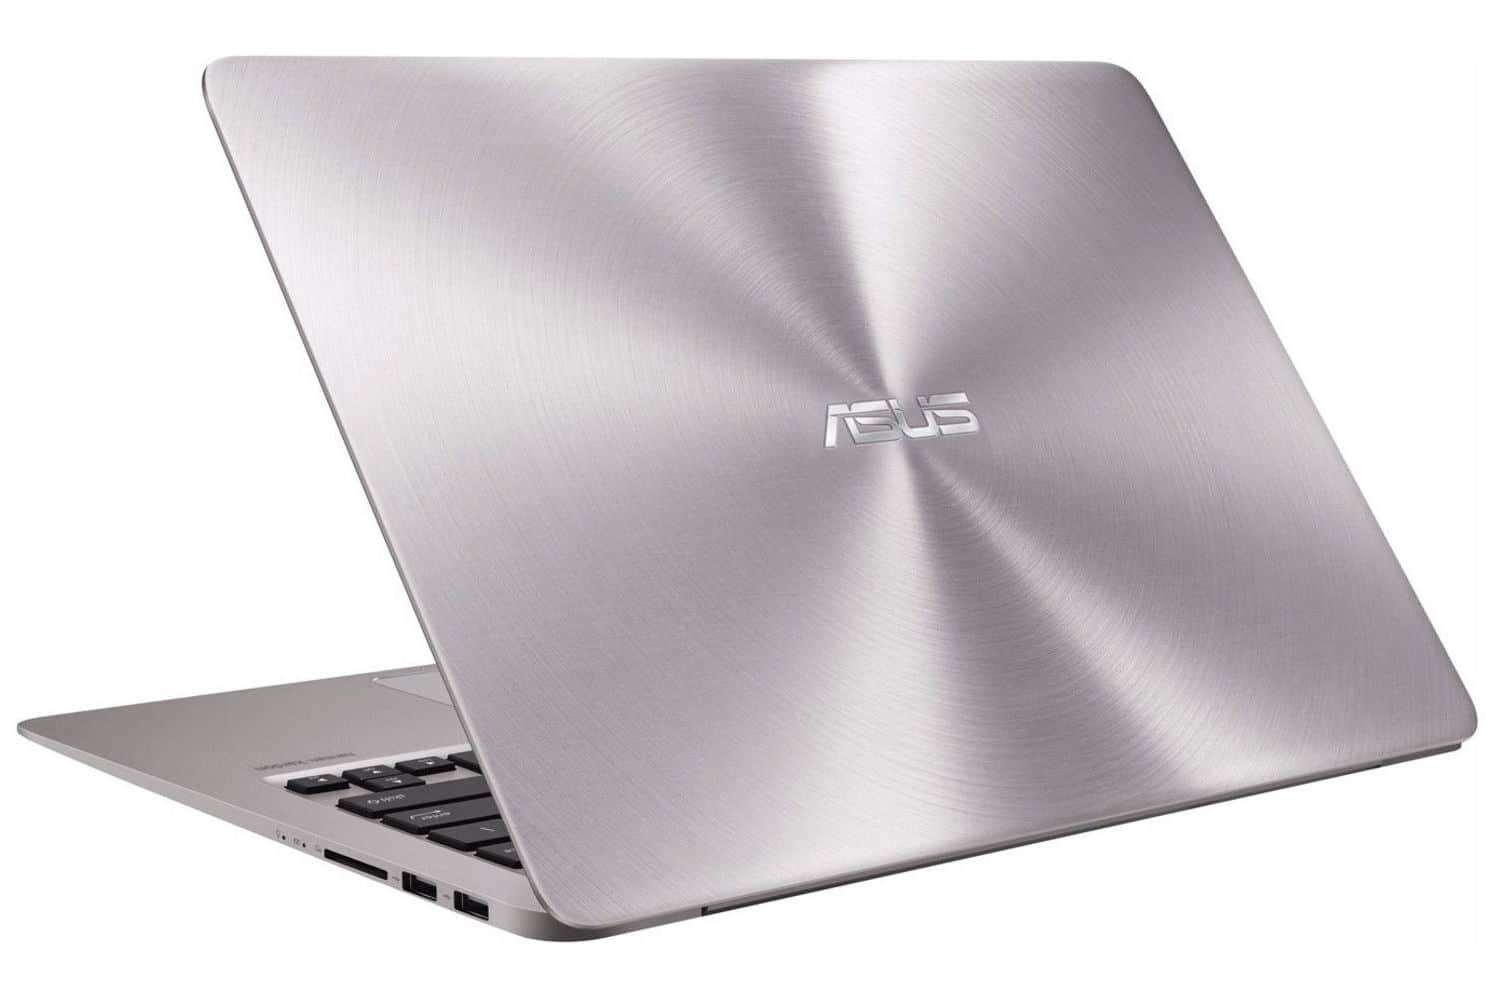 "Asus ZenBook UX410UA-GV428T, ultrabook 14"" léger (599€)"